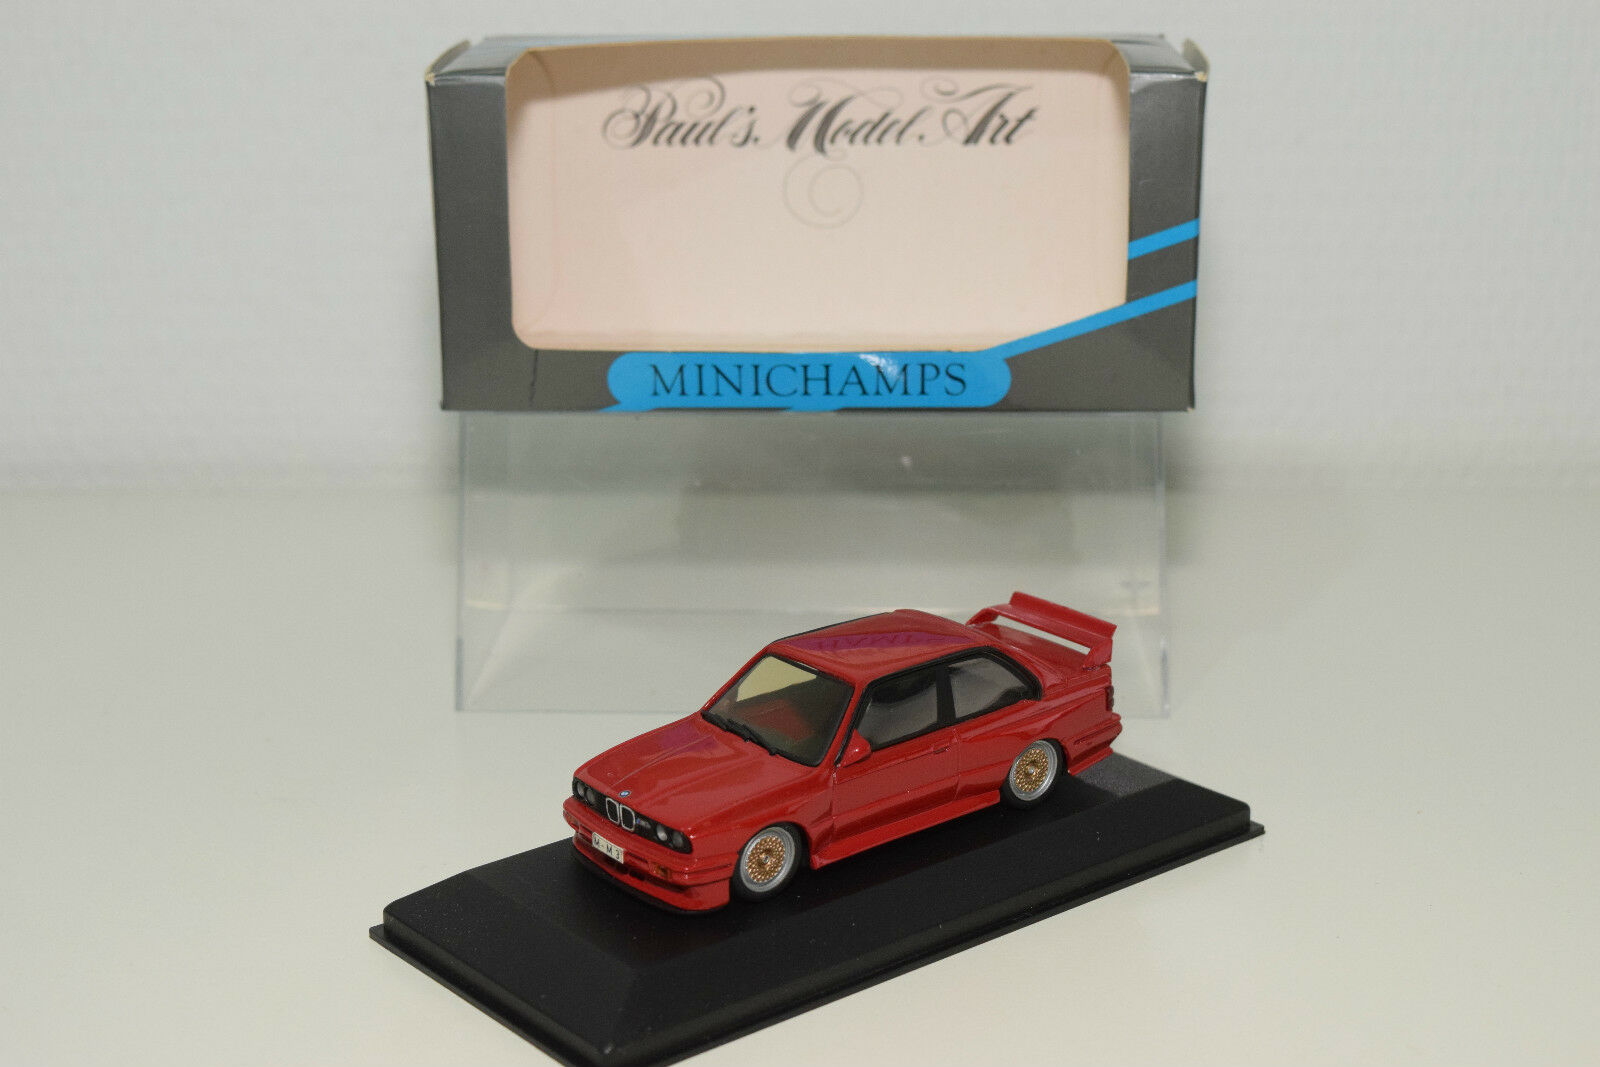 MINICHAMPS BMW M3 E30 STREET VERSION Rojo RARE HUBS MINT BOXED RARE SELTEN RARO